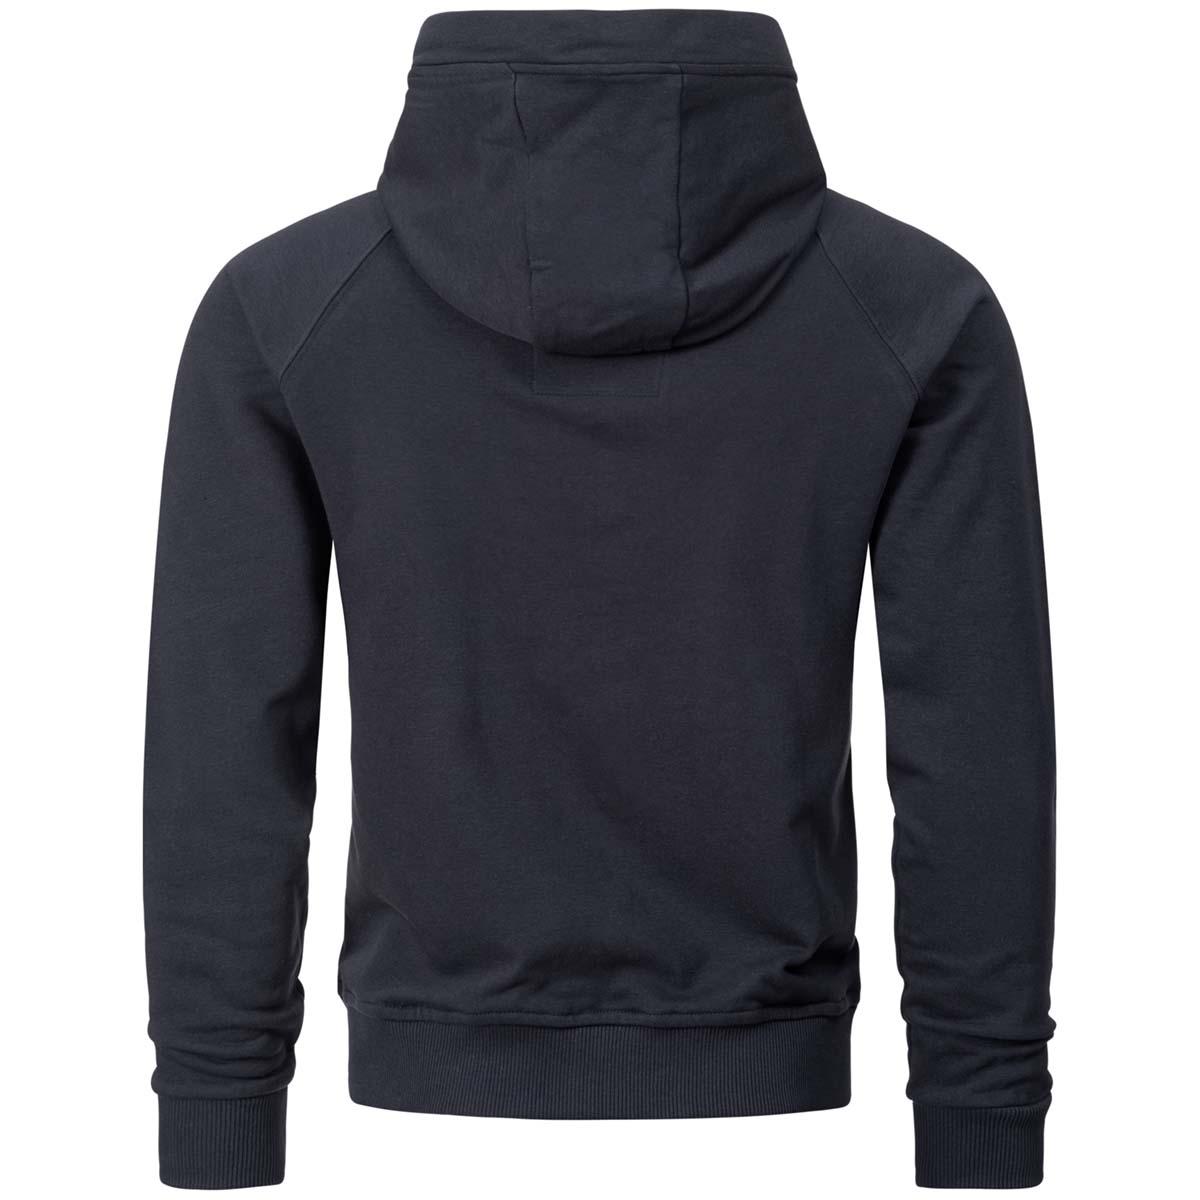 A-Salvarini-Herren-Sweatjacke-Kapuzenpullover-Jacke-Kapuze-Hoodie-Sweater-AS192 Indexbild 13